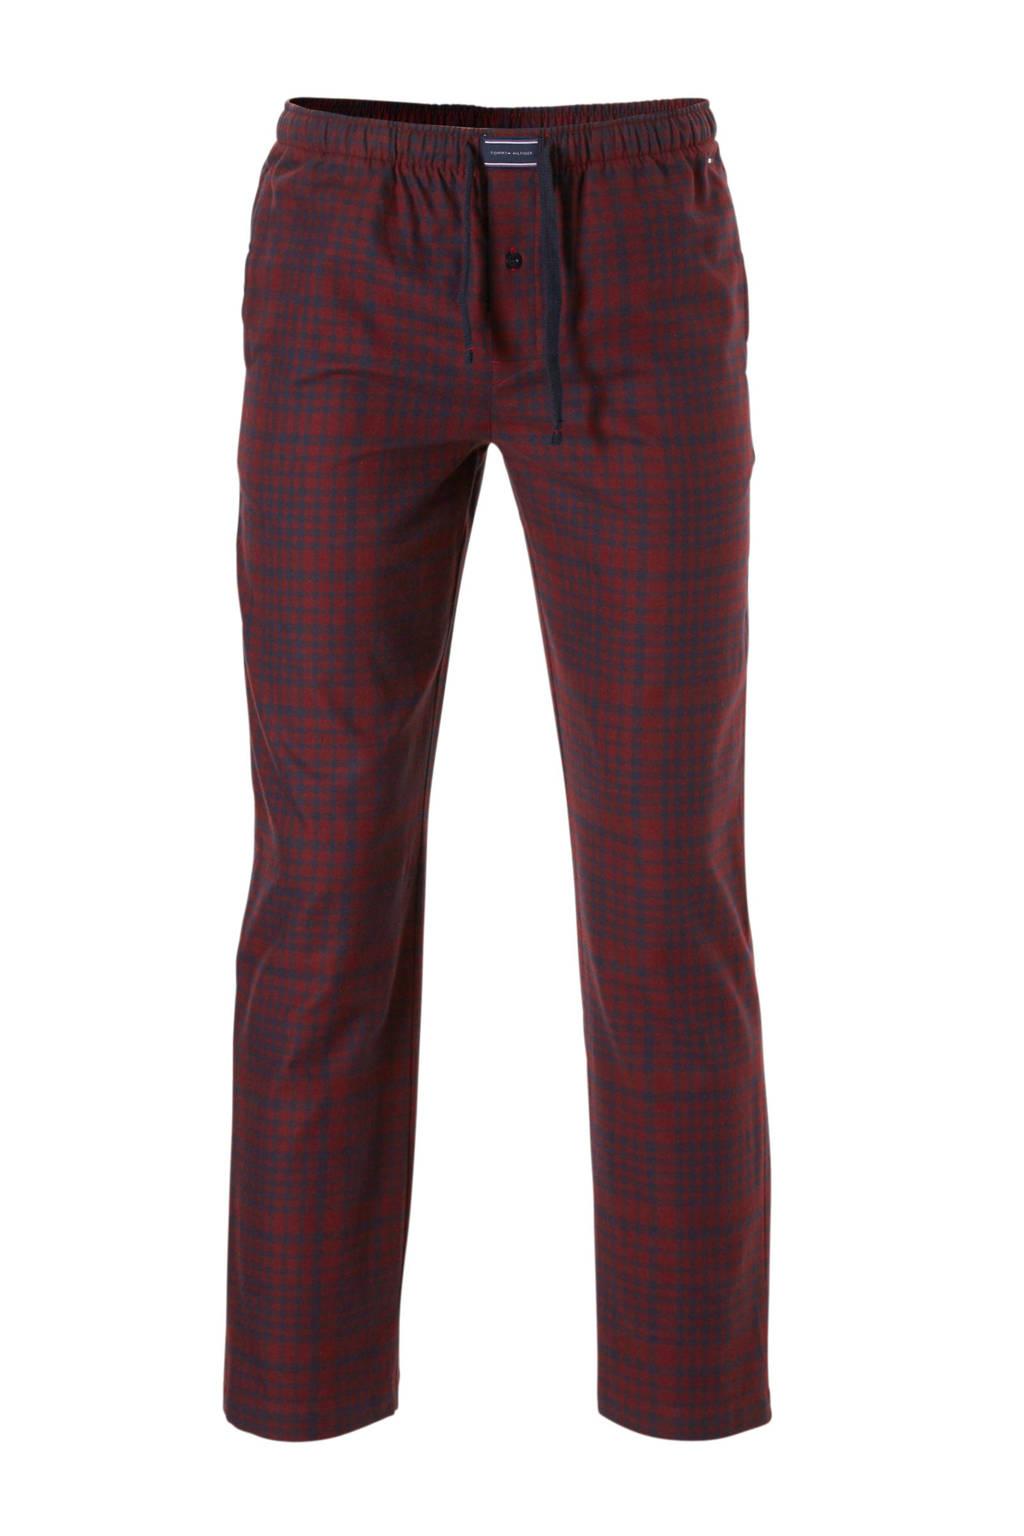 Tommy Hilfiger pyjamabroek geruit flanel, Rood/marine